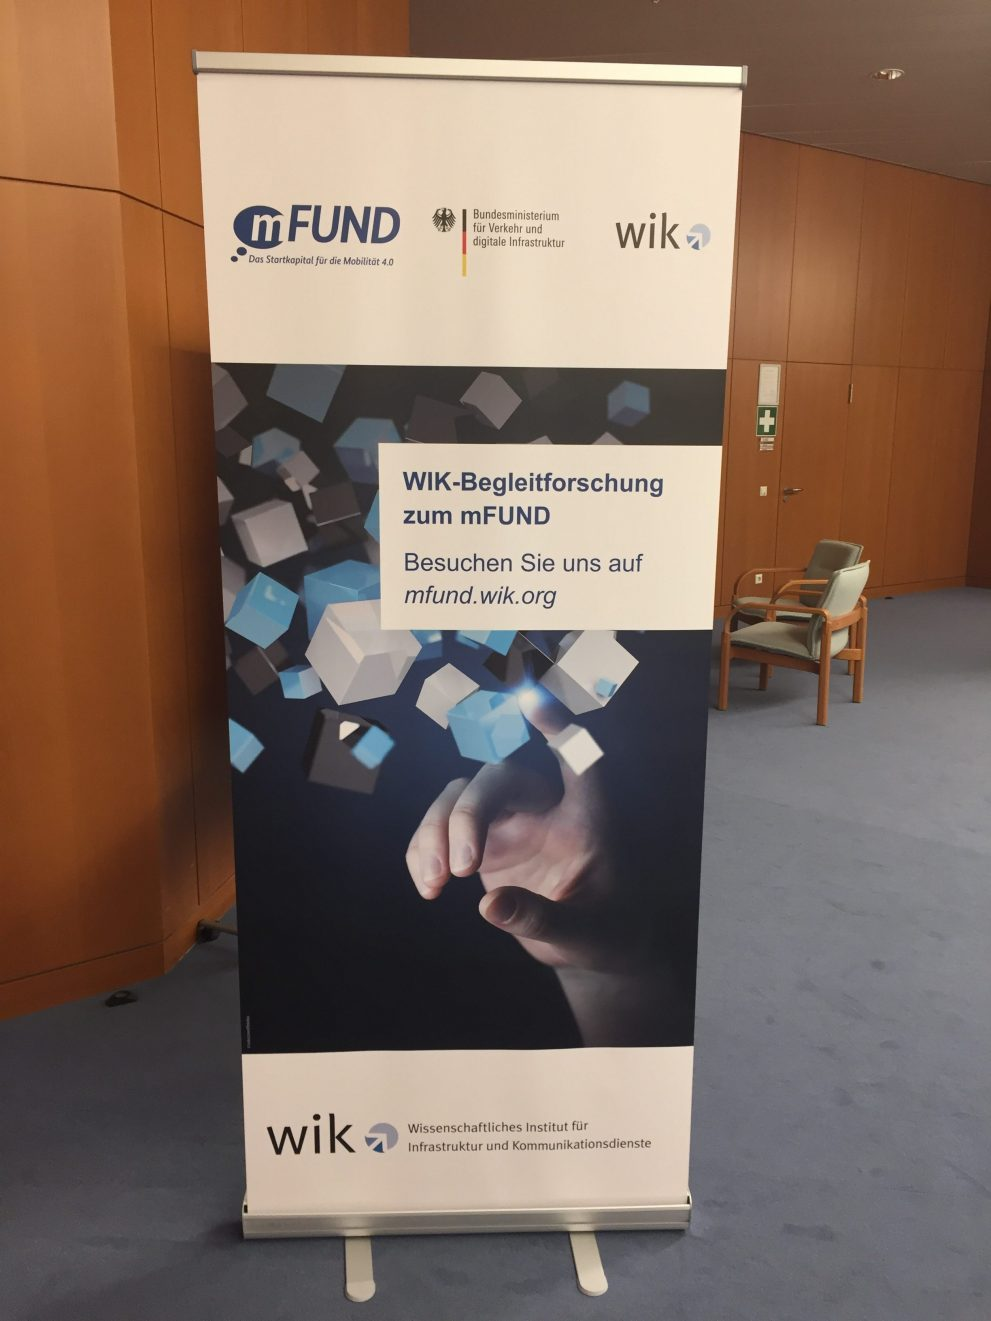 Arbeitsgruppentreffen Datenschutz und Compliance der Begleitforschung